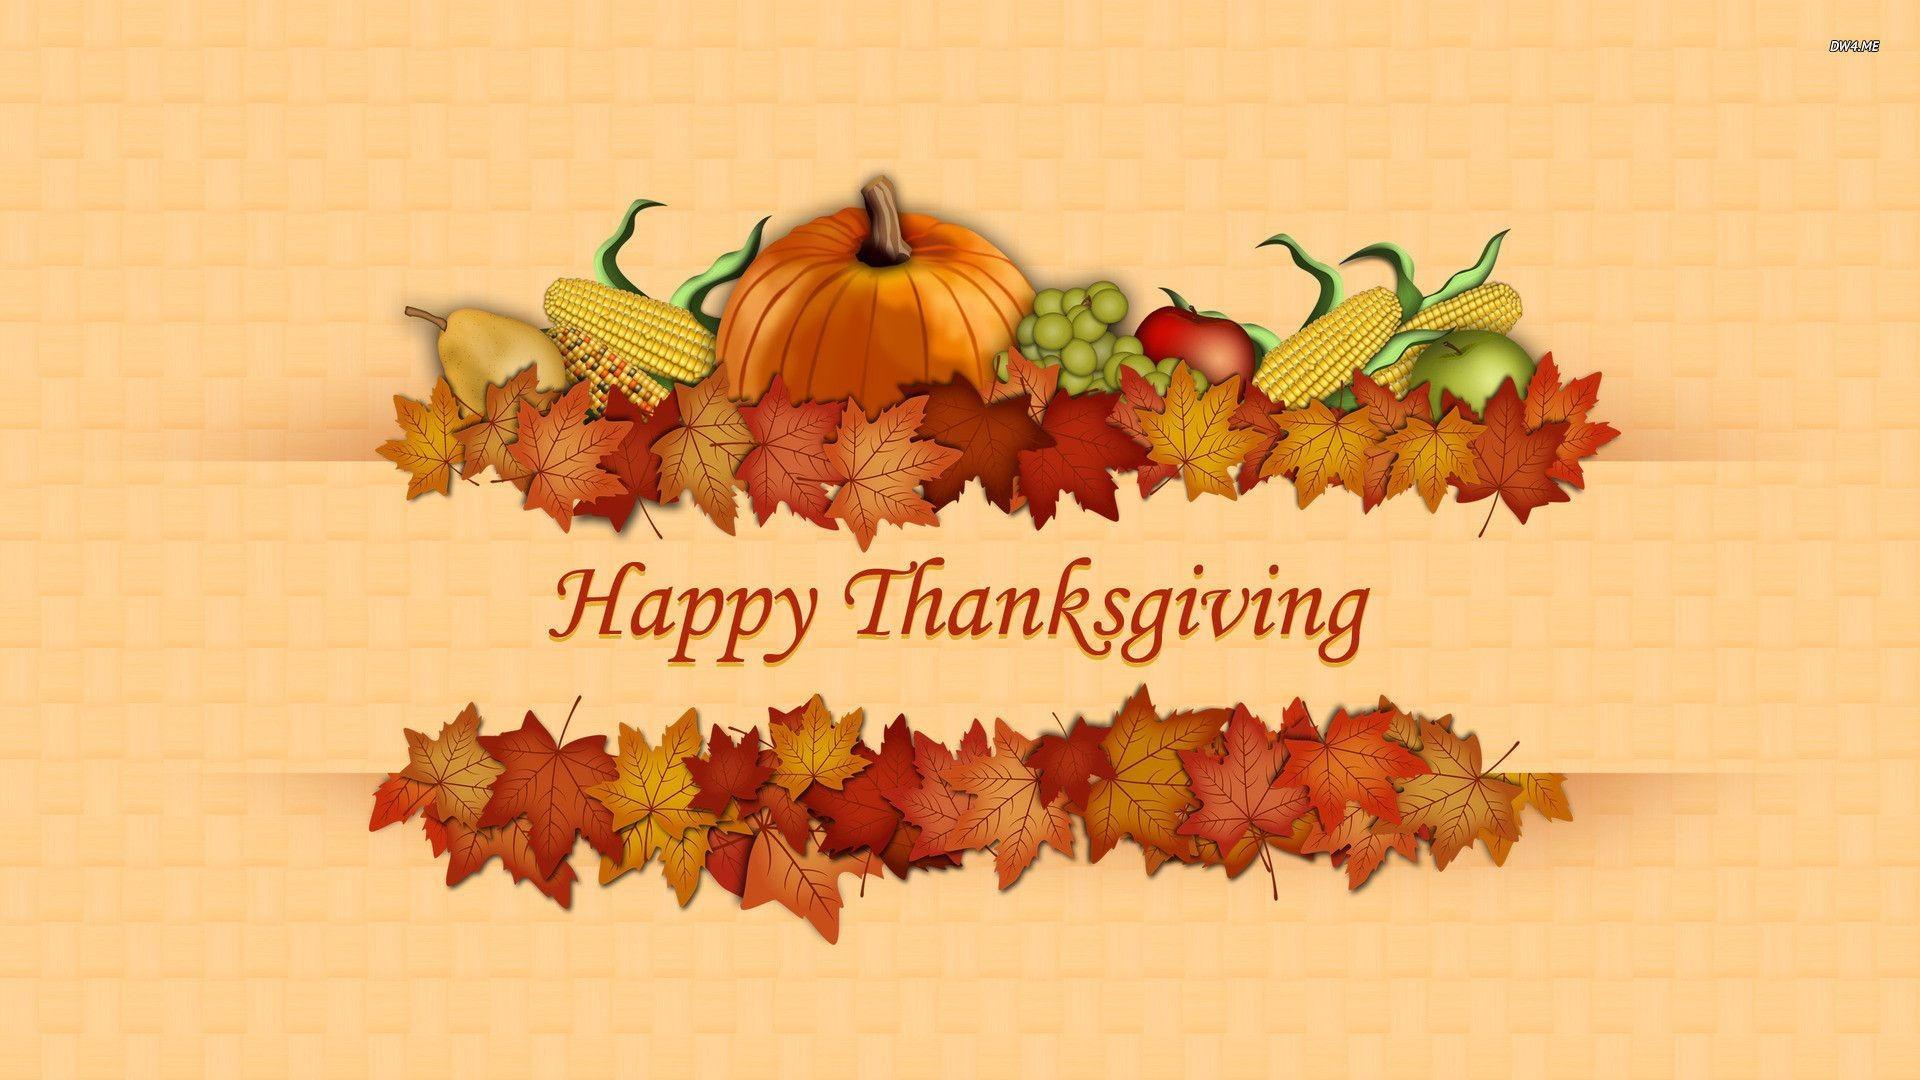 Res: 1920x1080, Thanksgiving Desktop Wallpapers Free - Wallpaper Cave